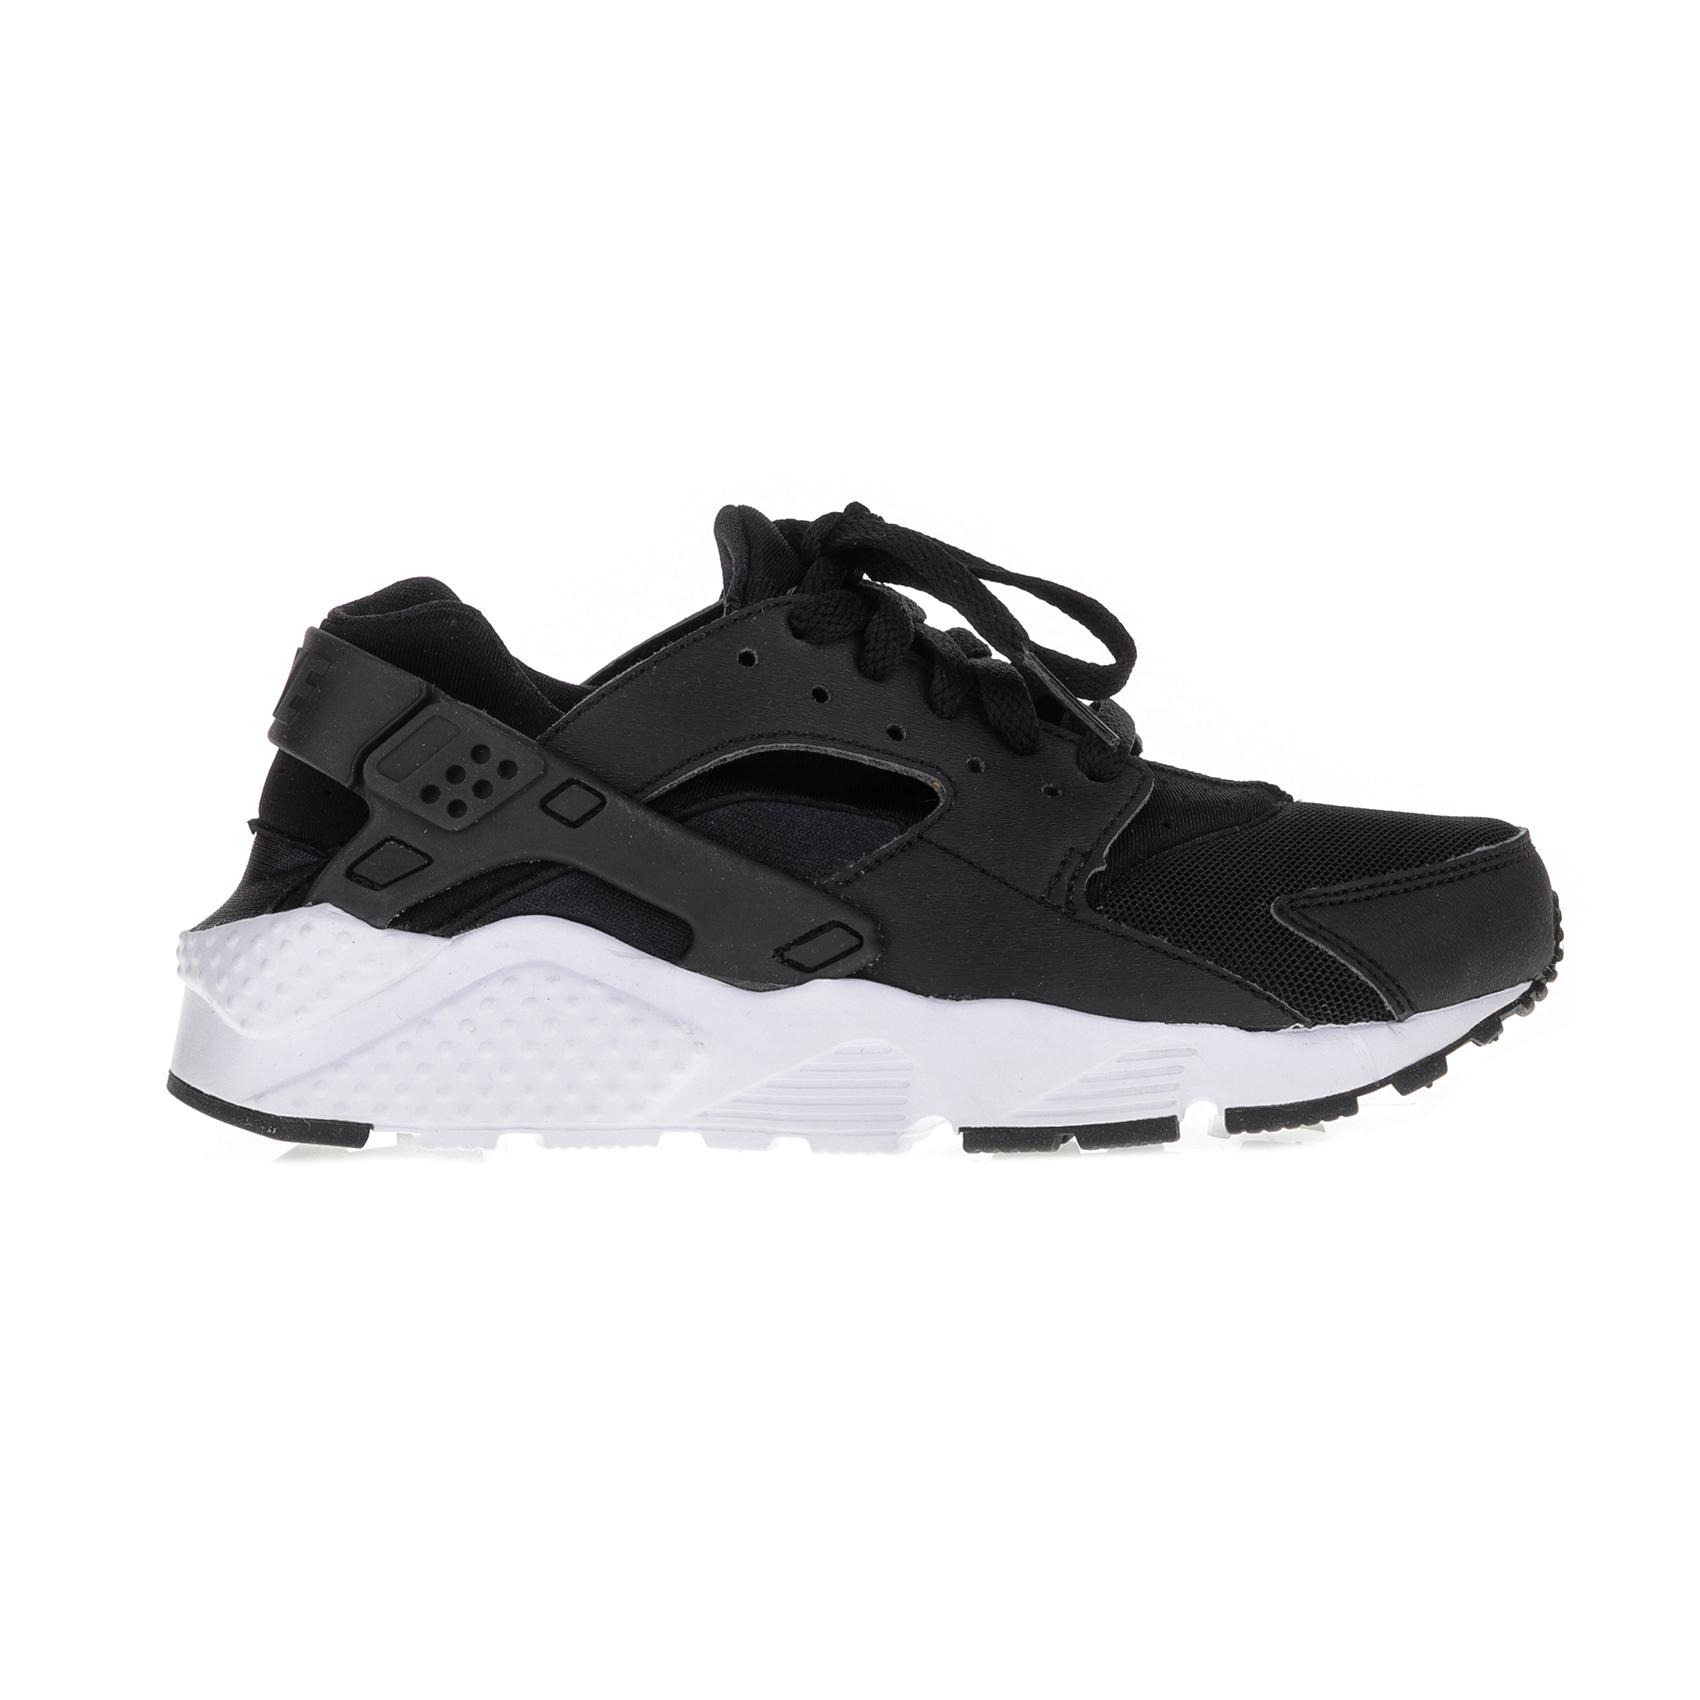 NIKE – Παιδικά αθλητικά παπούτσια Nike HUARACHE RUN (GS) μαύρα – λευκά